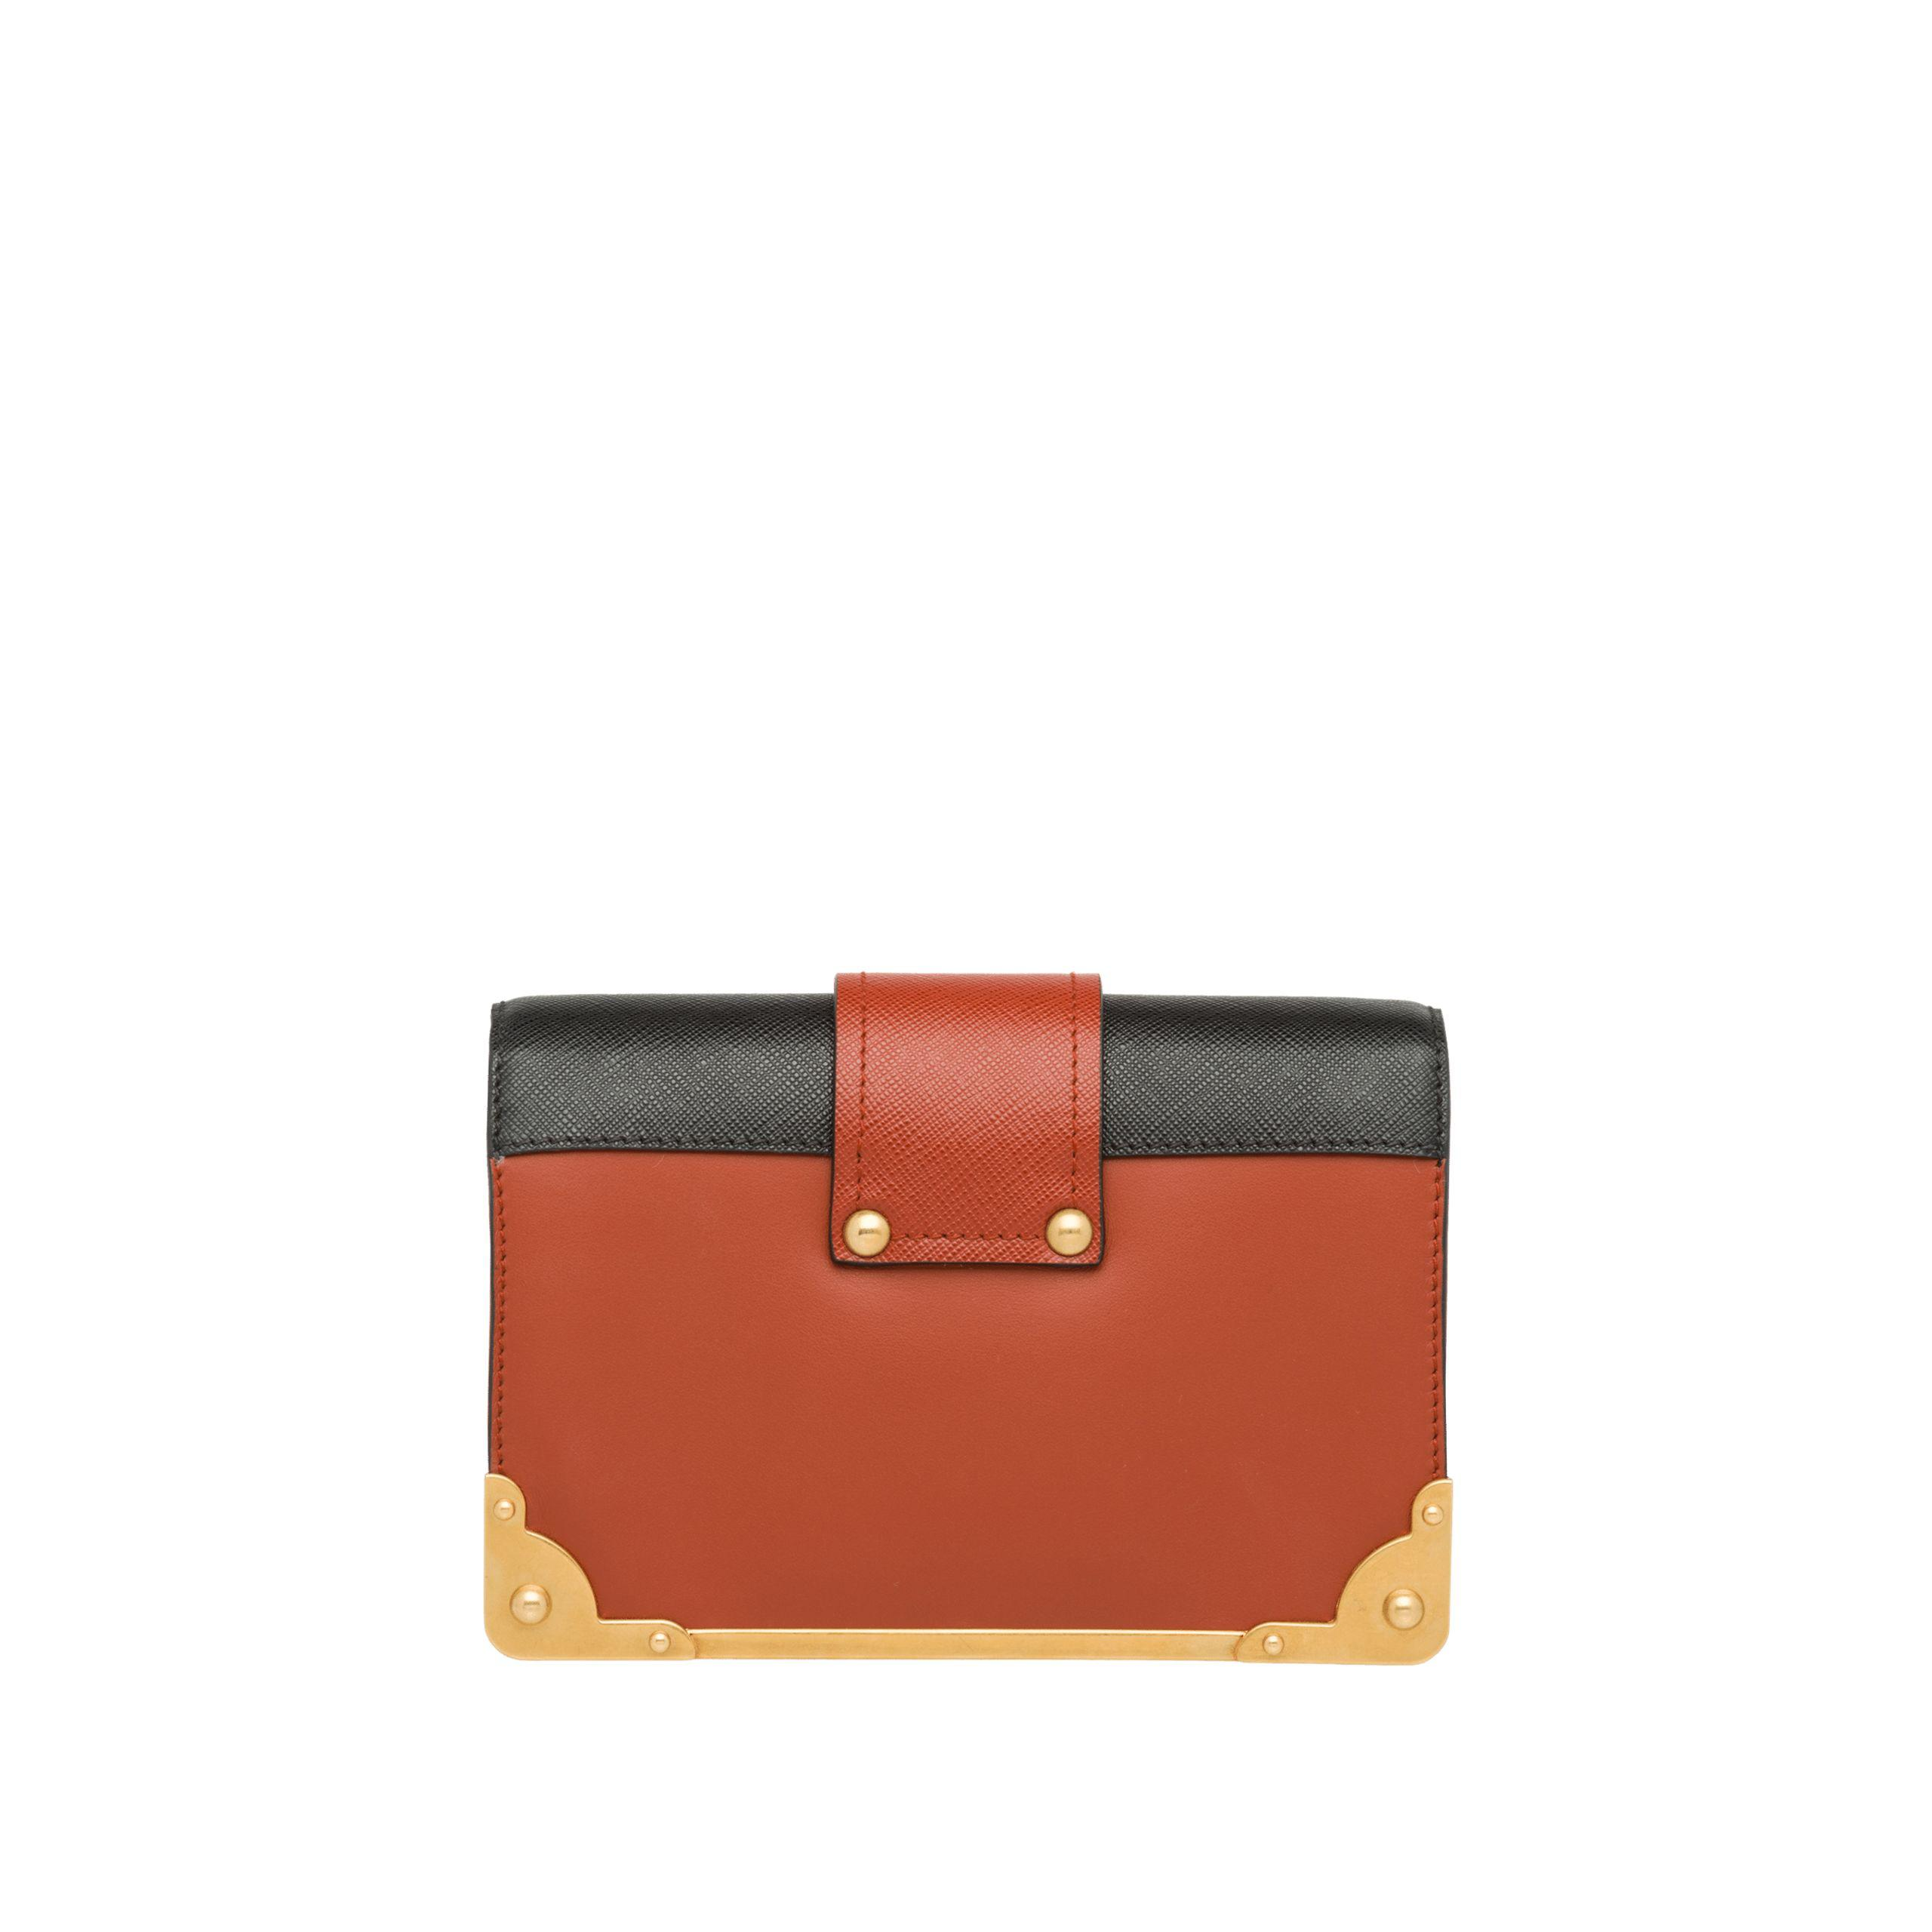 595894d7a367 Lyst - Prada Cahier Leather Shoulder Bag